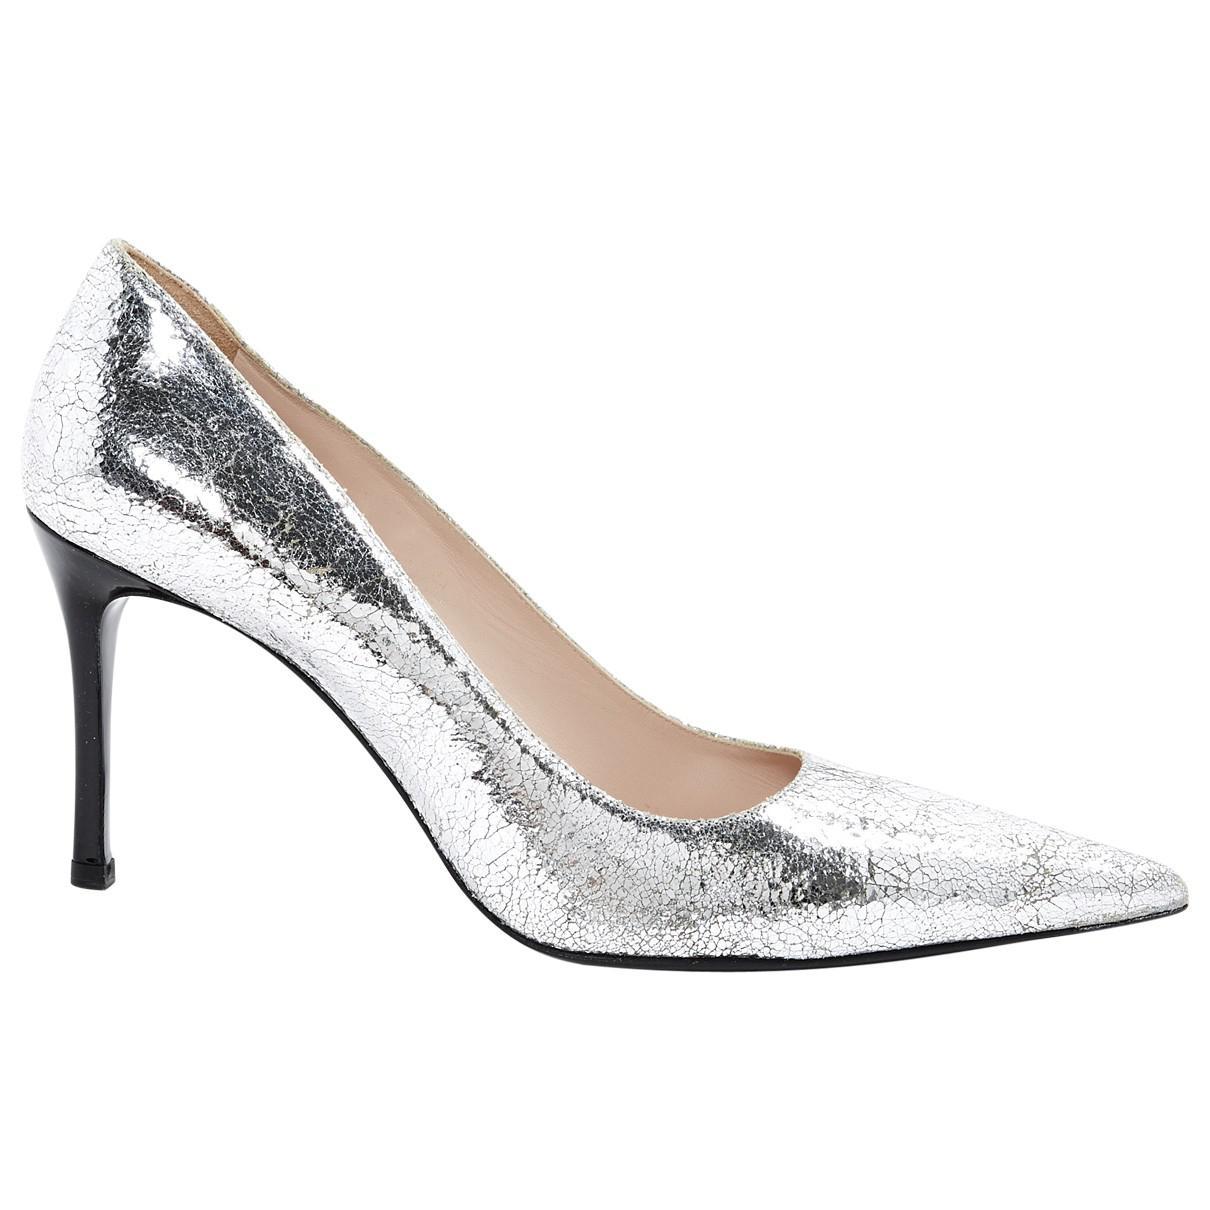 Pre-owned - Silver Leather Heels Miu Miu dpbWt9g